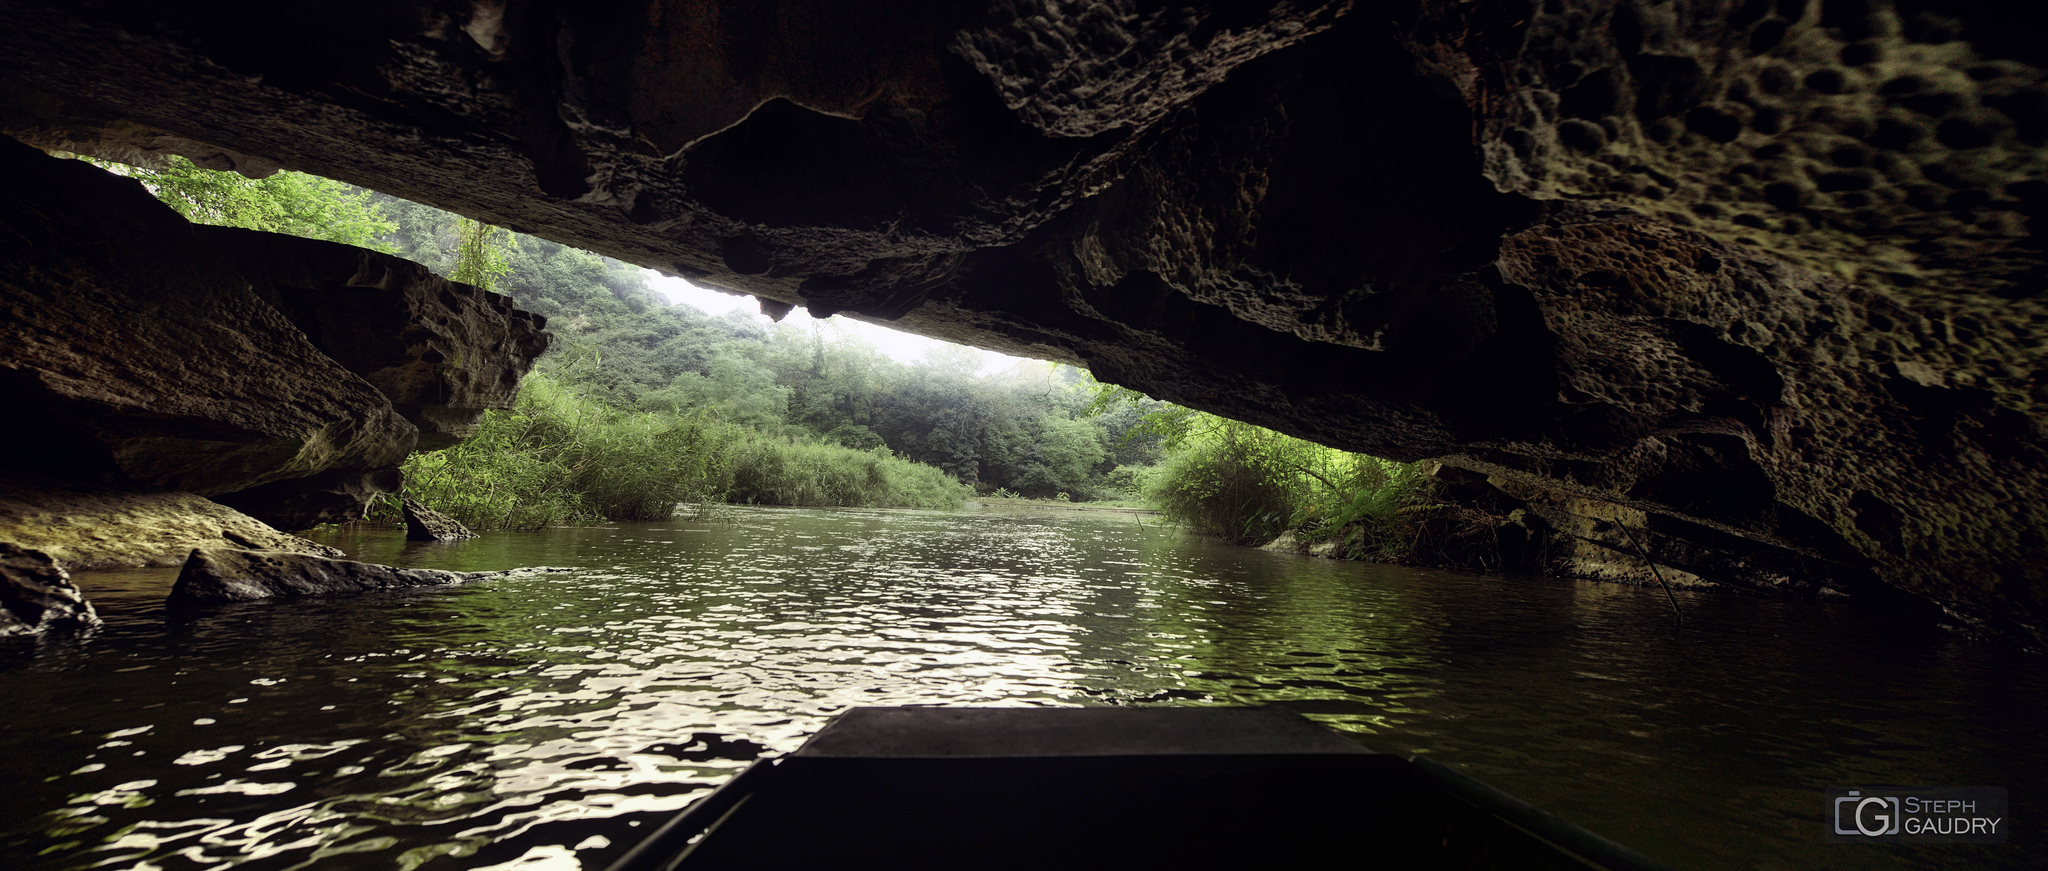 Grottes Tam Coc, et la rivière Ngo Dong (Ninh Binh)